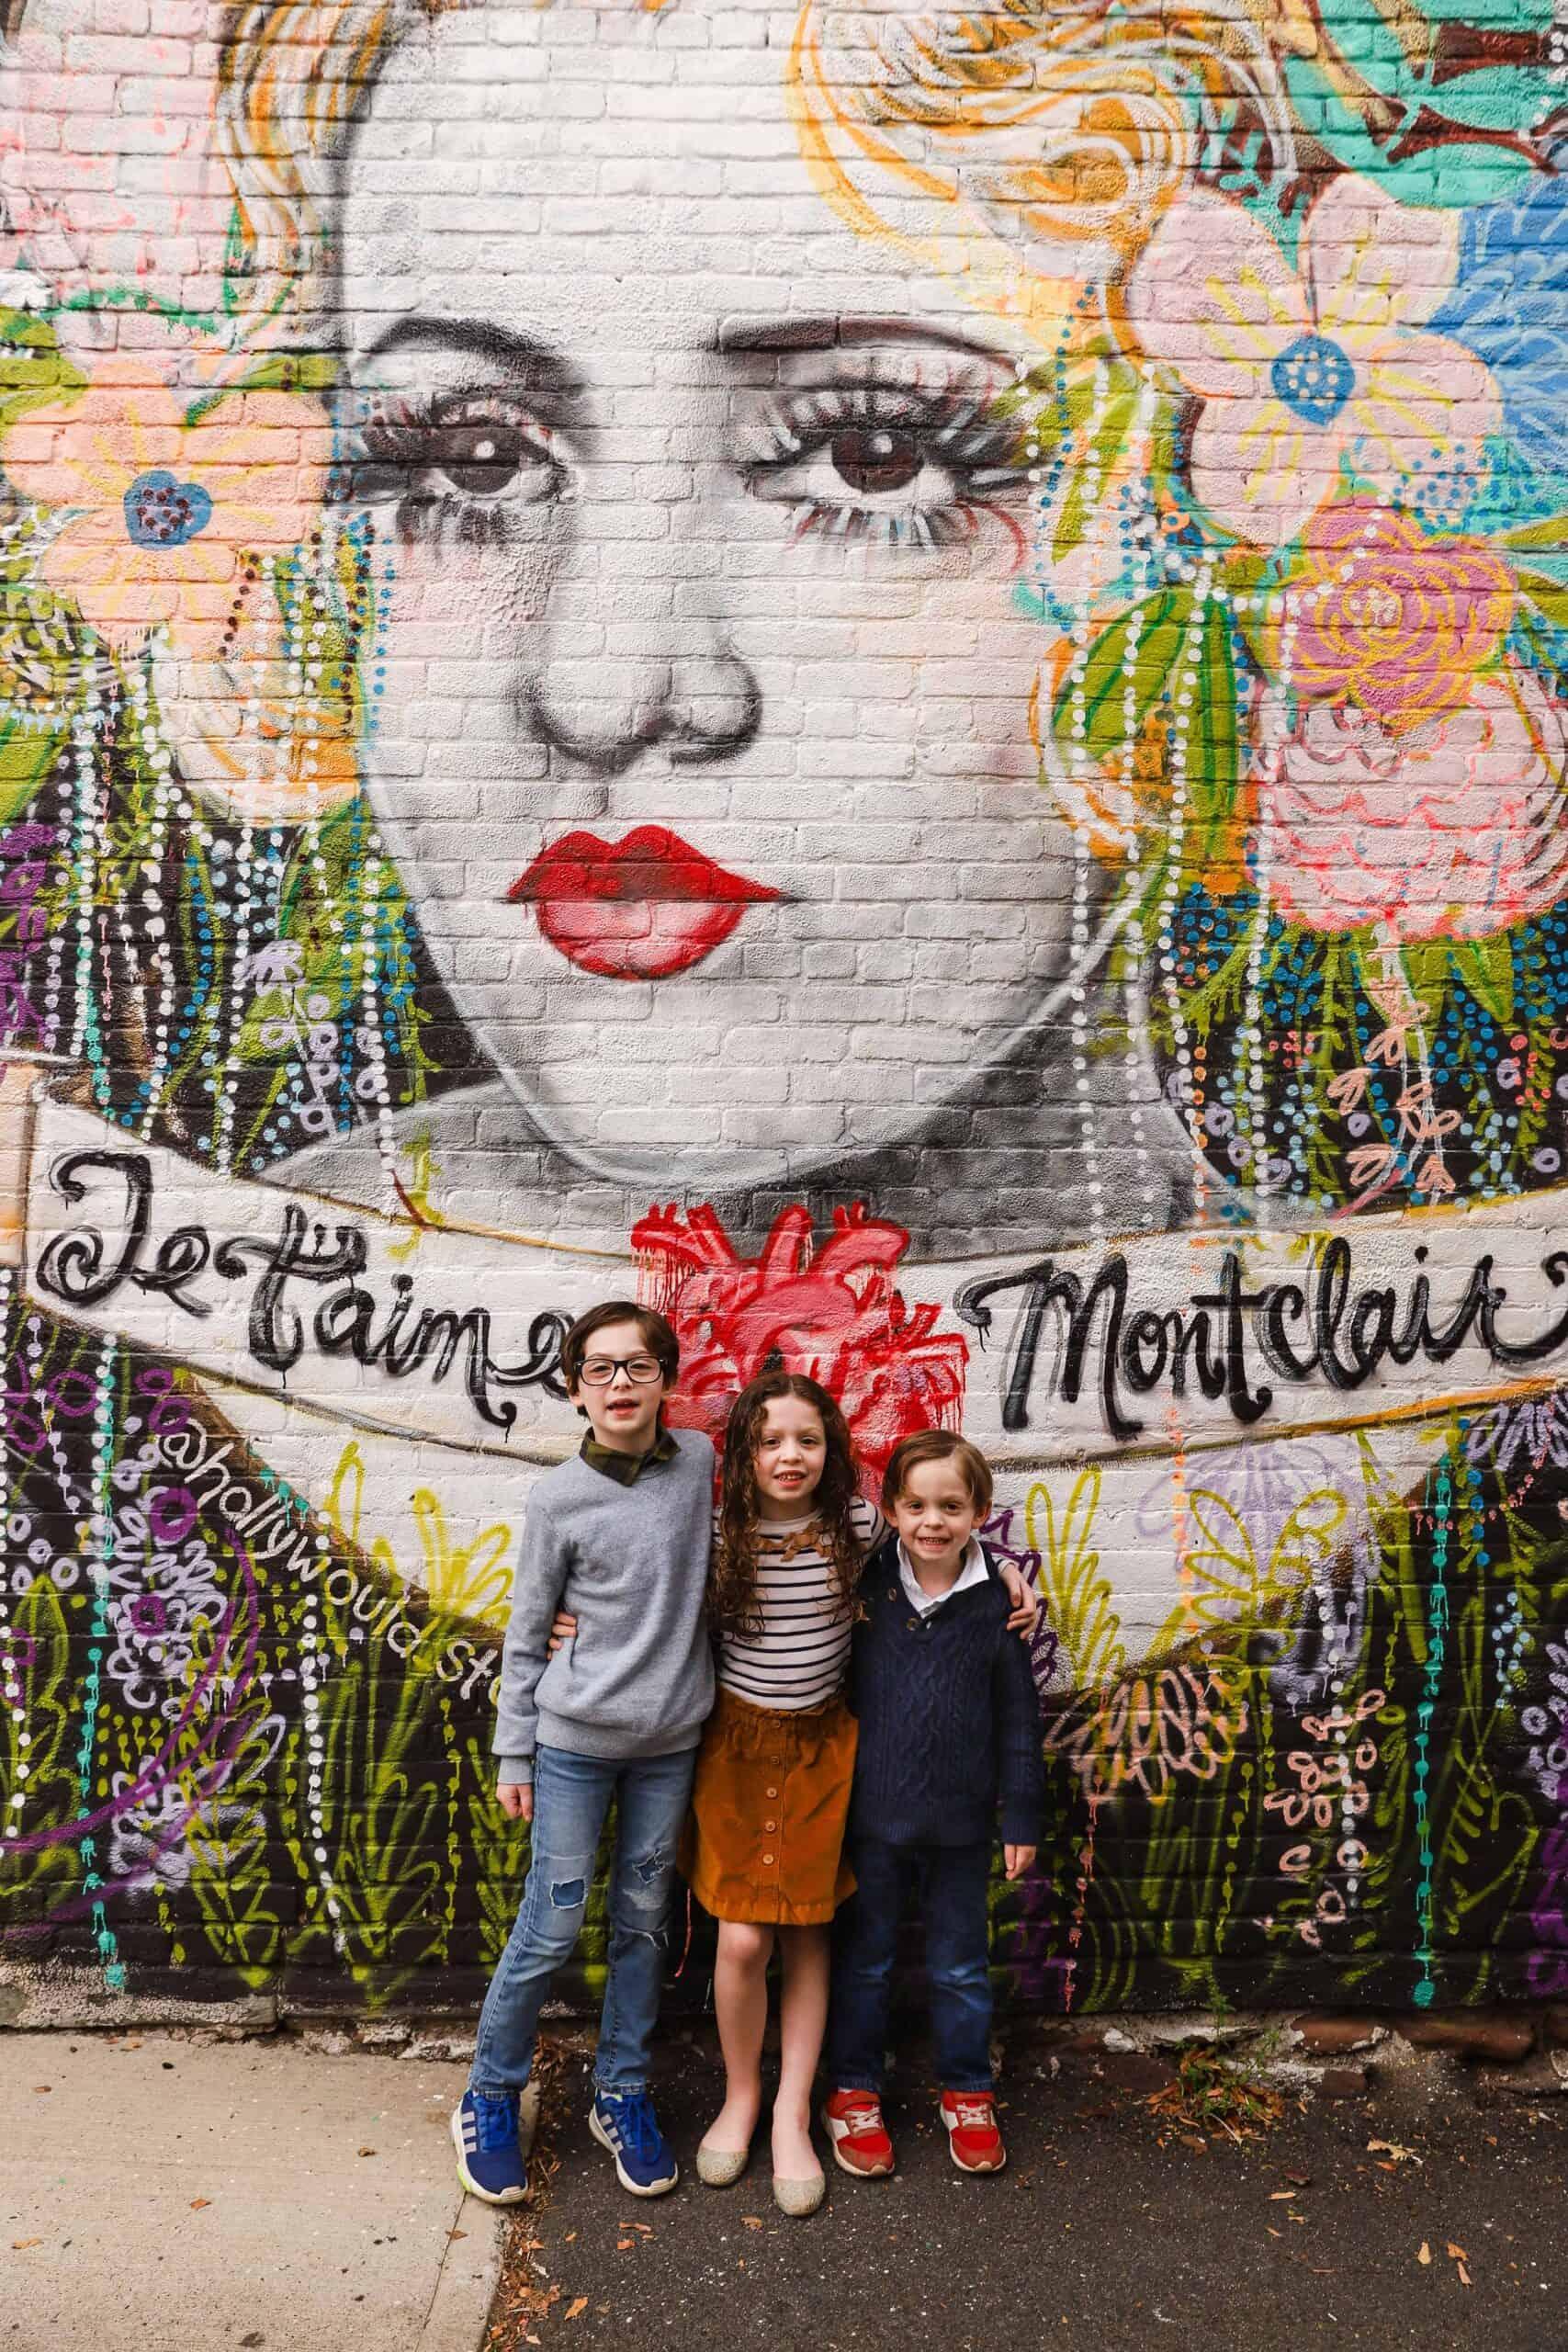 Kids in front of Montclair mural